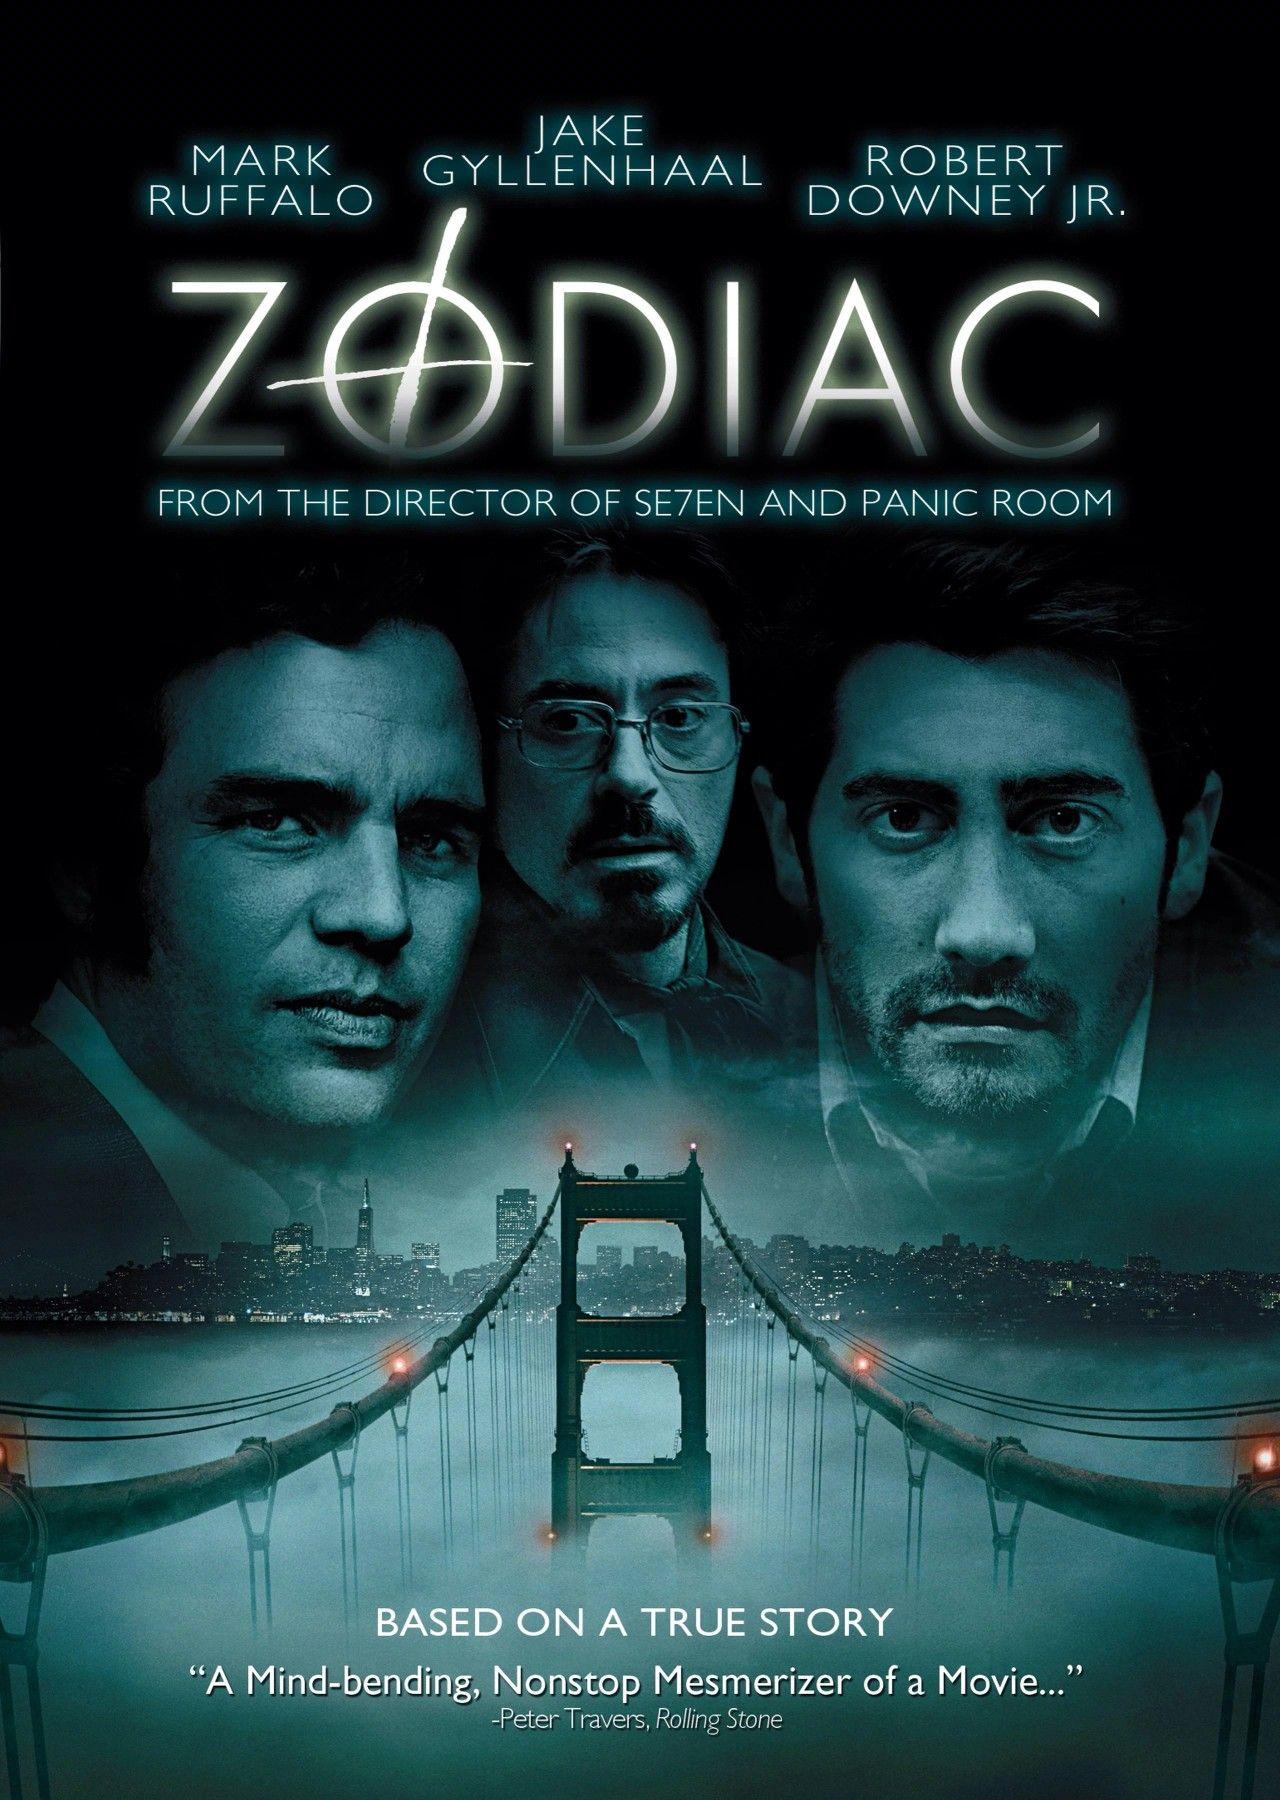 Zodiac Thriller Movies Zodiac Film True Stories